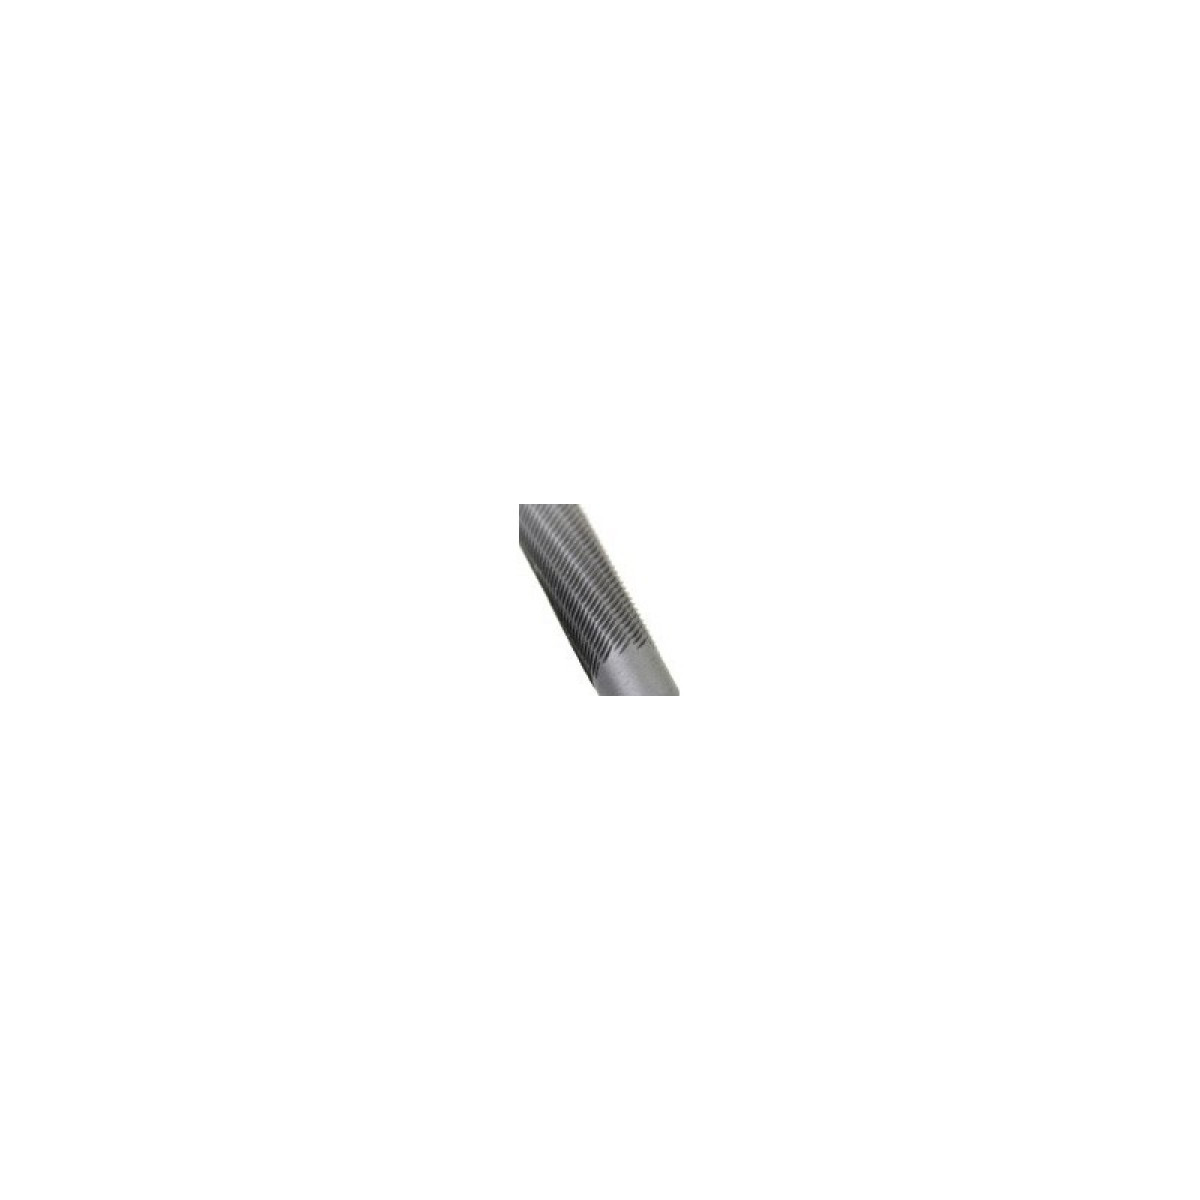 Pilník kulatý 3,5 mm - 1ks - OREGON